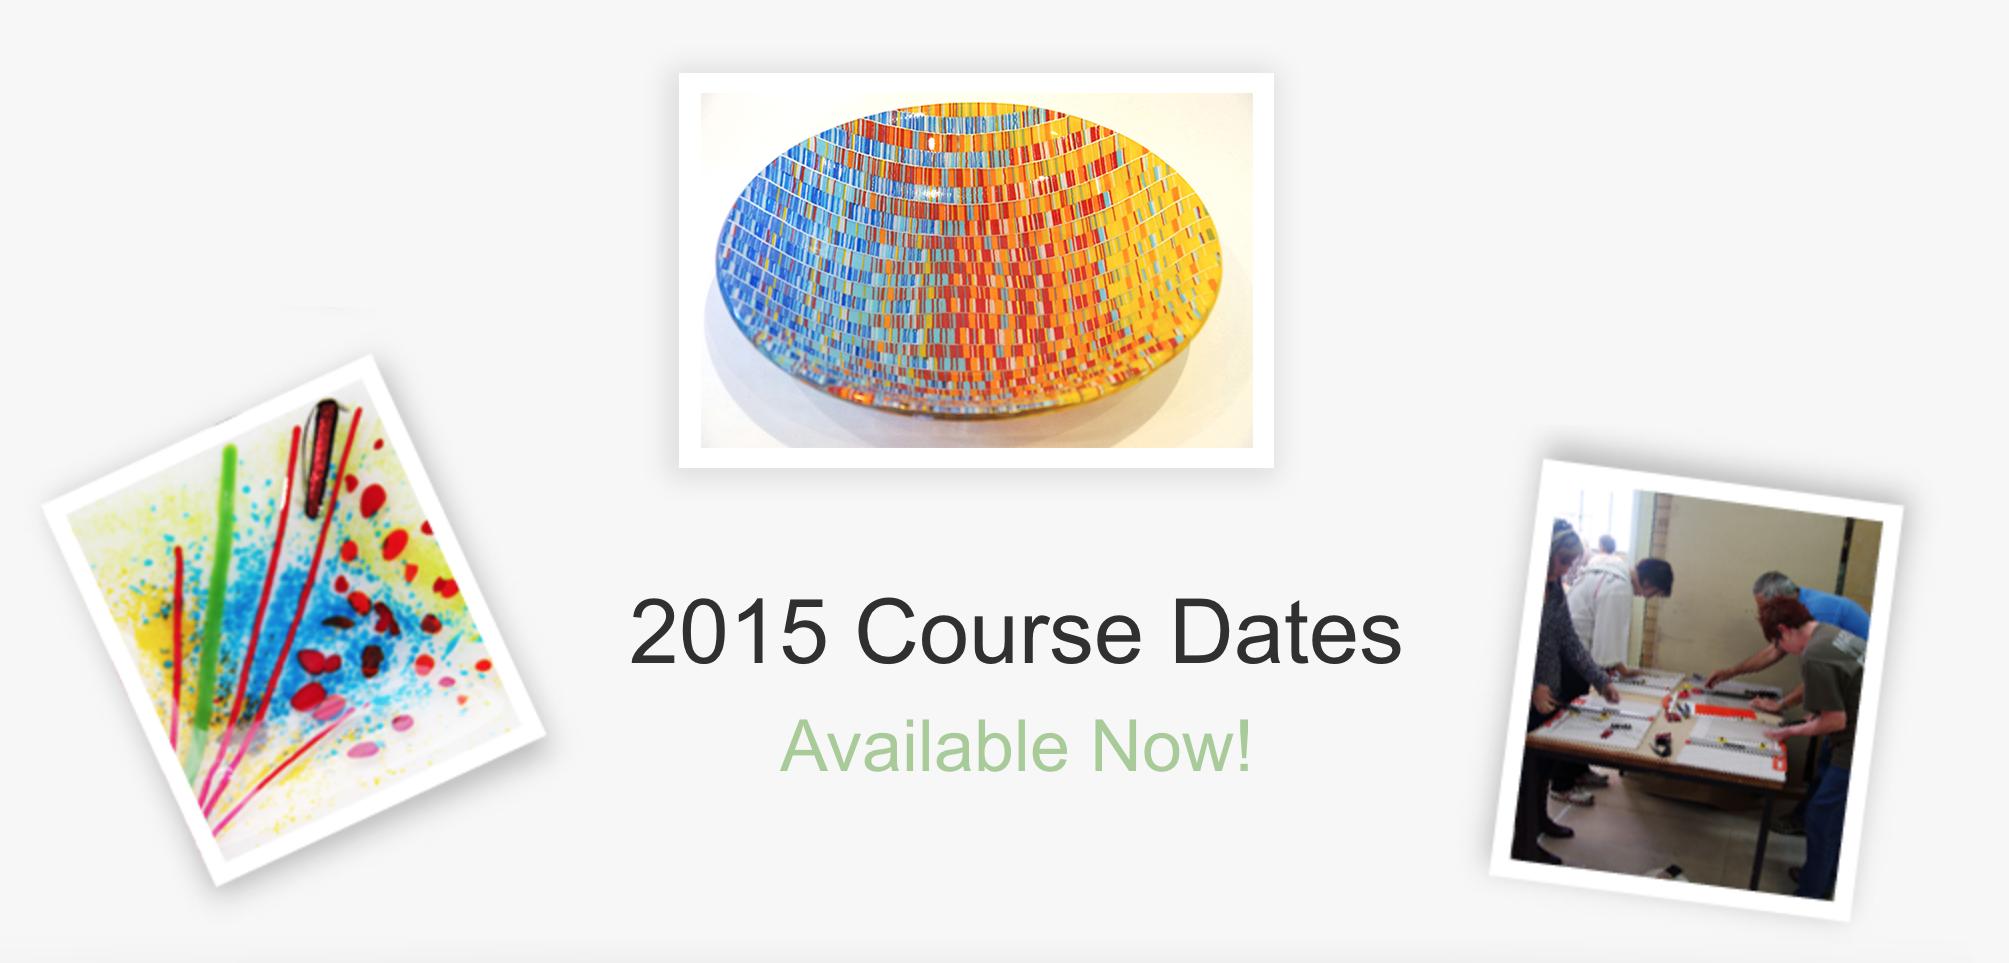 2015 Course Dates